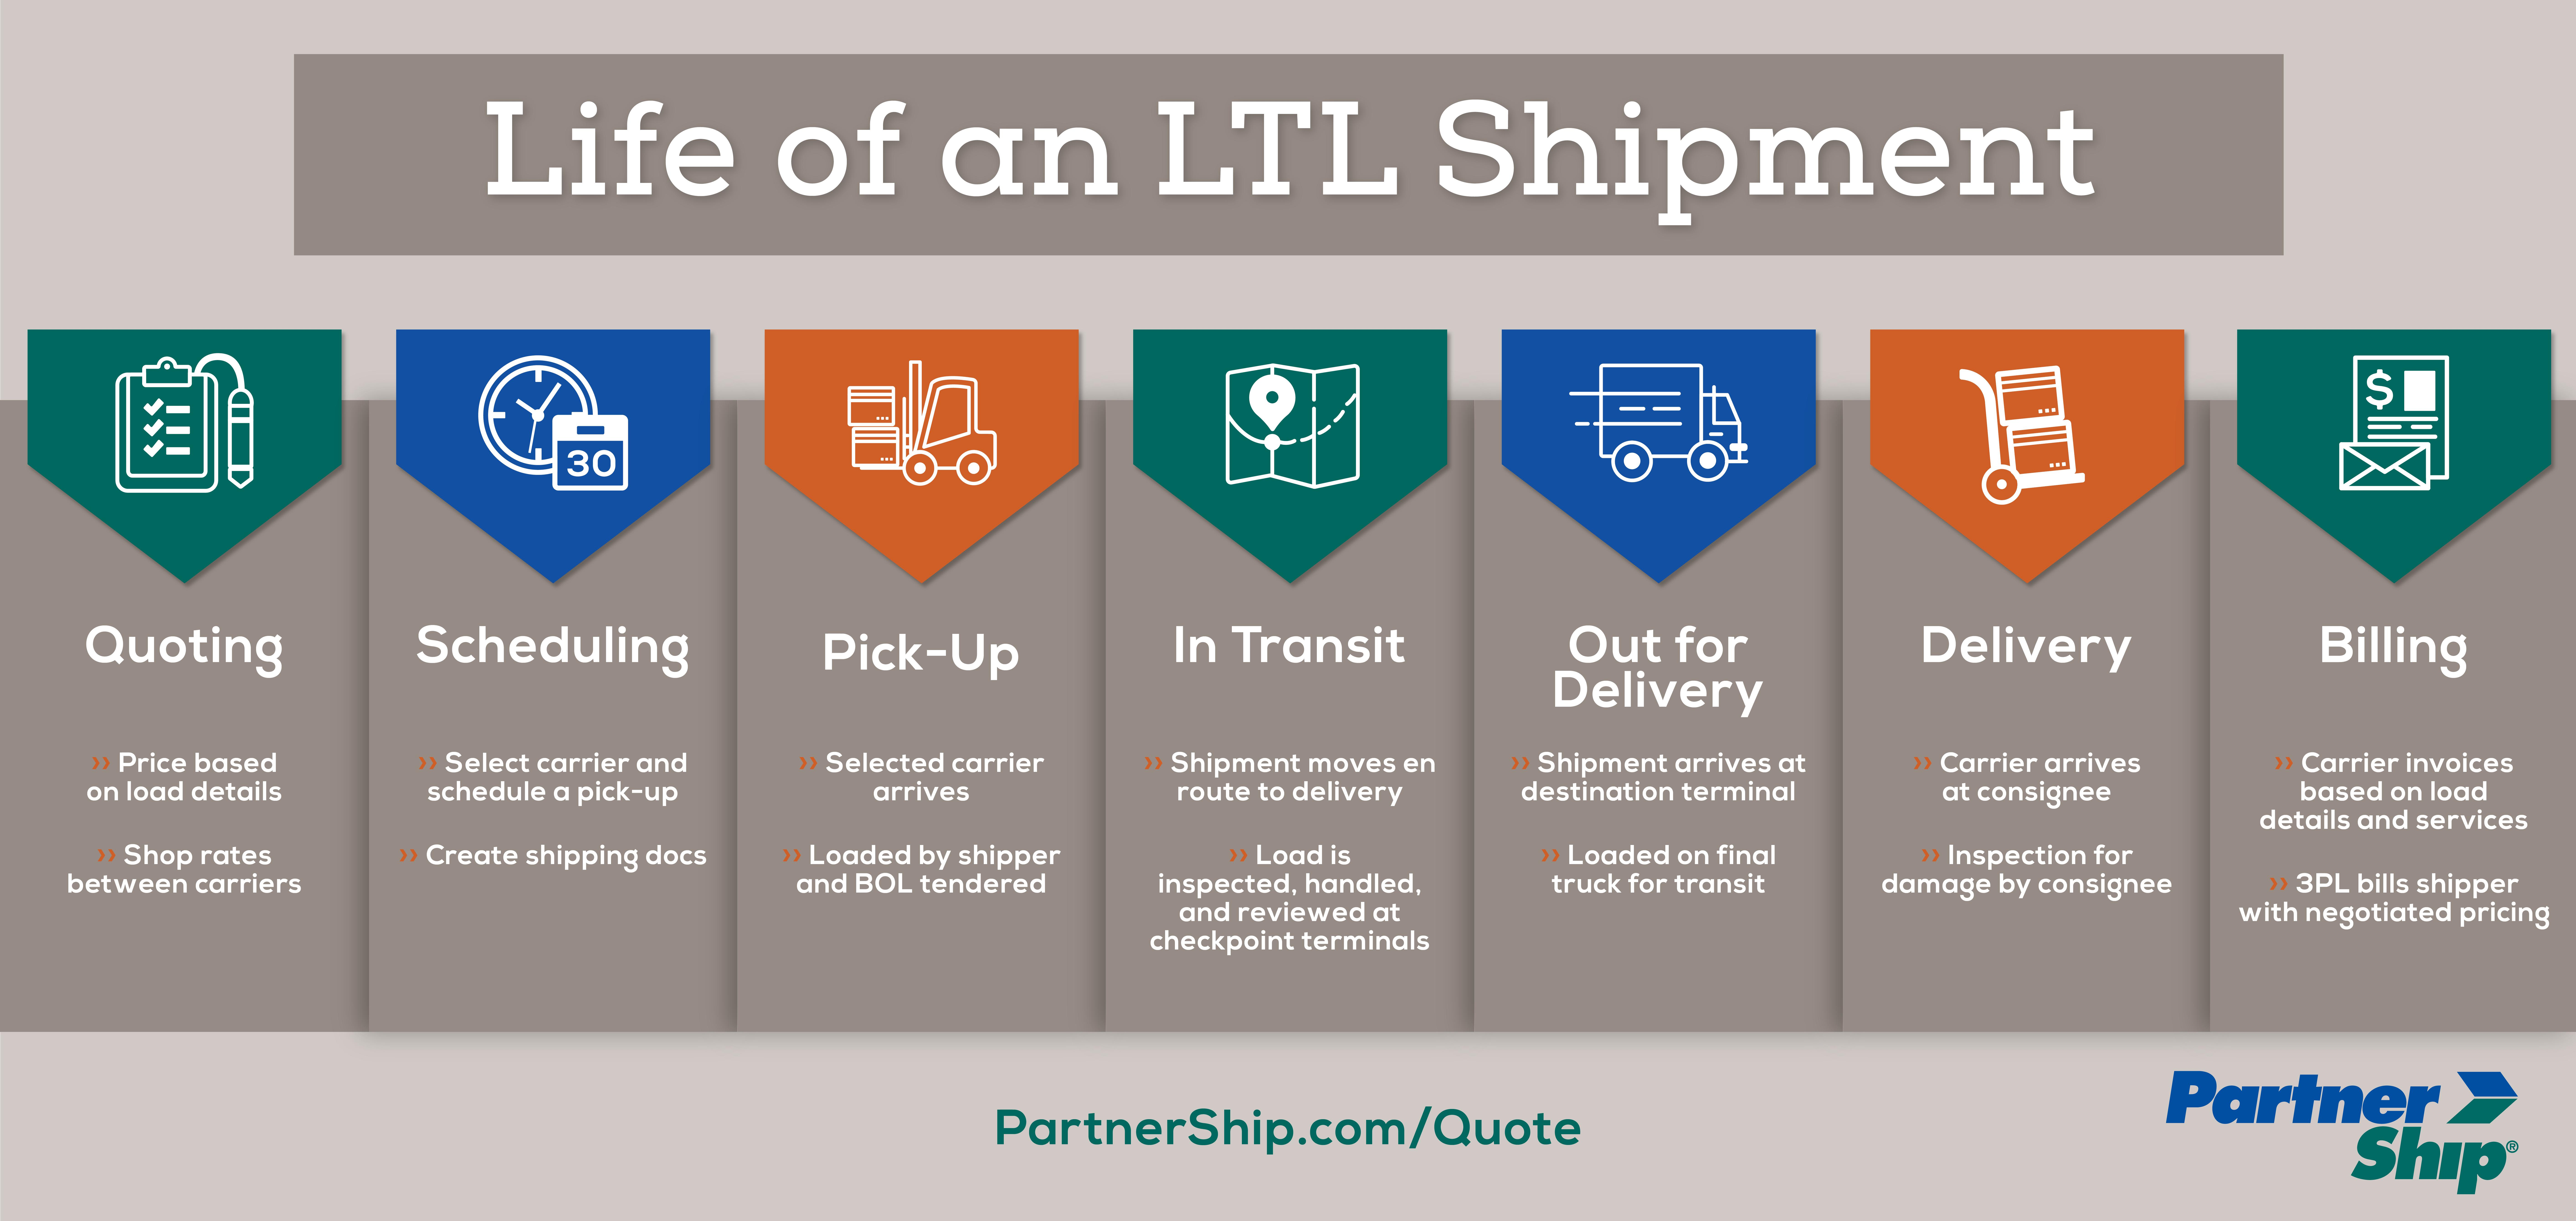 Life of LTL Shipment Infographic